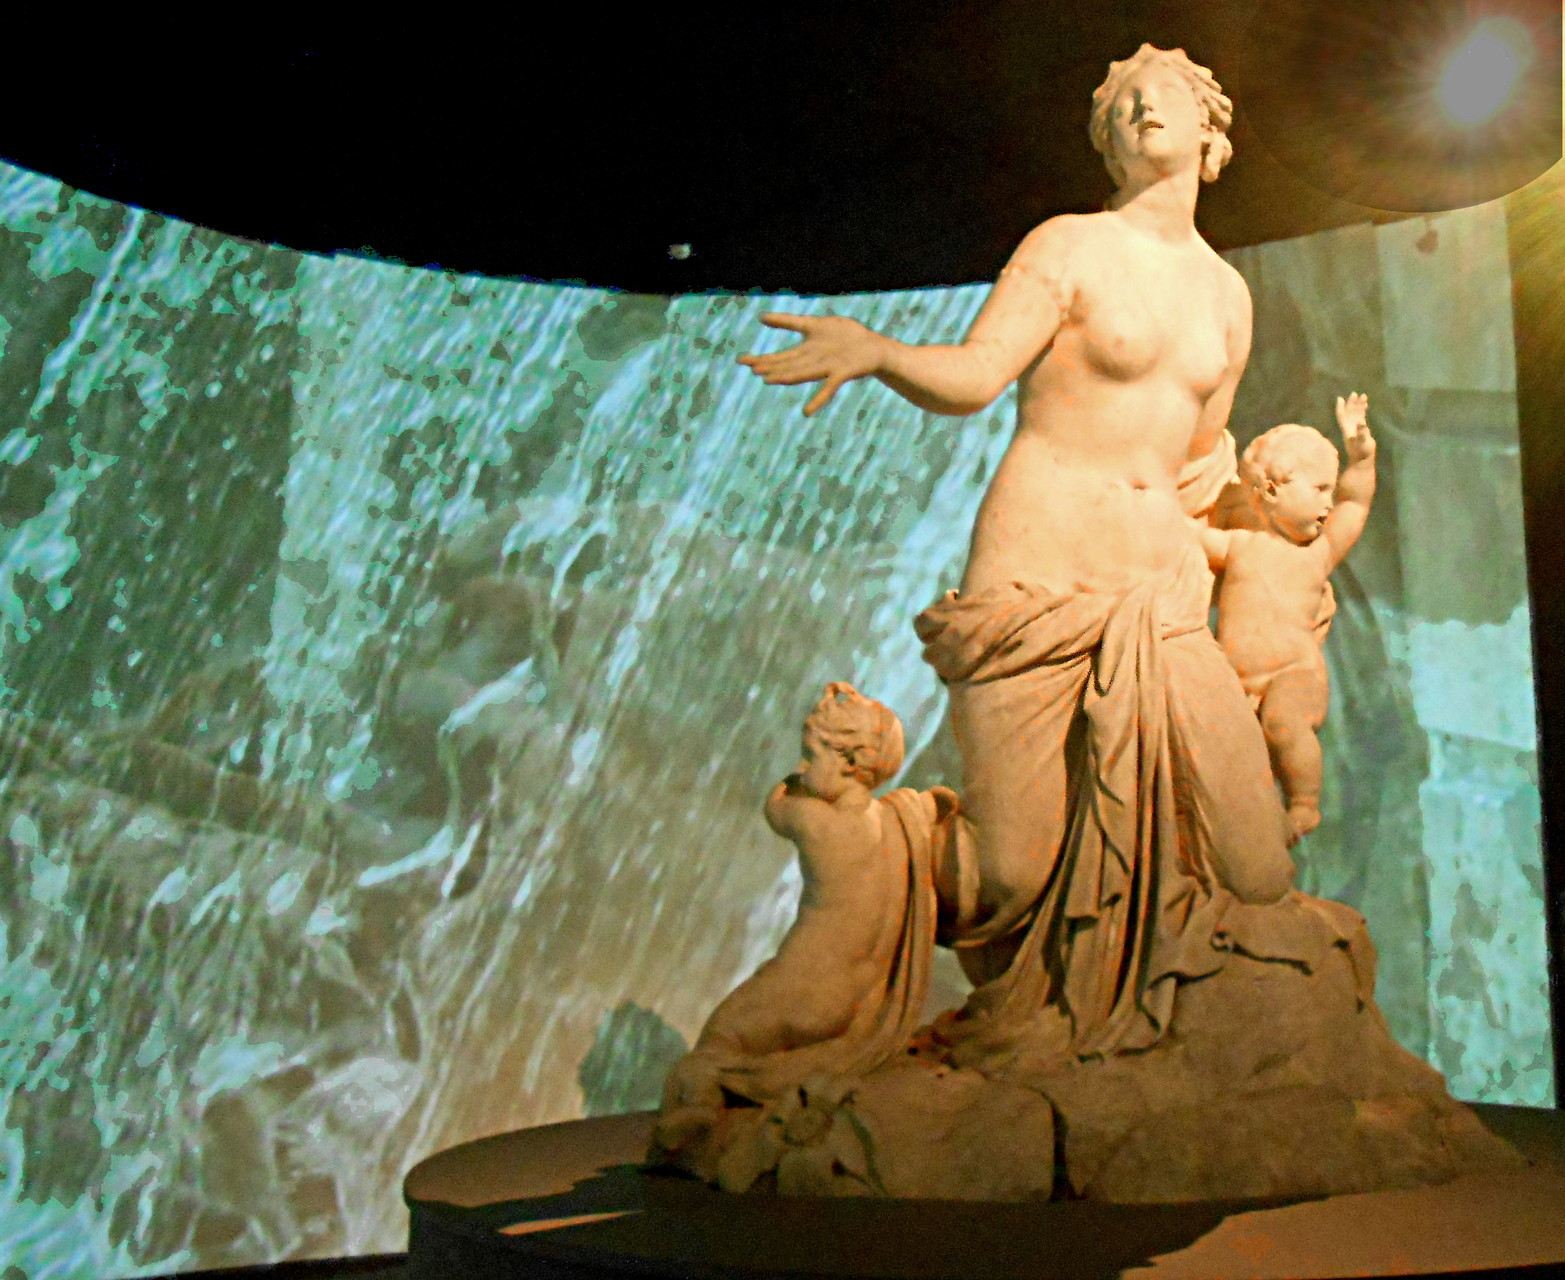 Latone et ses enfants, Gaspard et Balthazard Marsy, 1668-1670, marbre